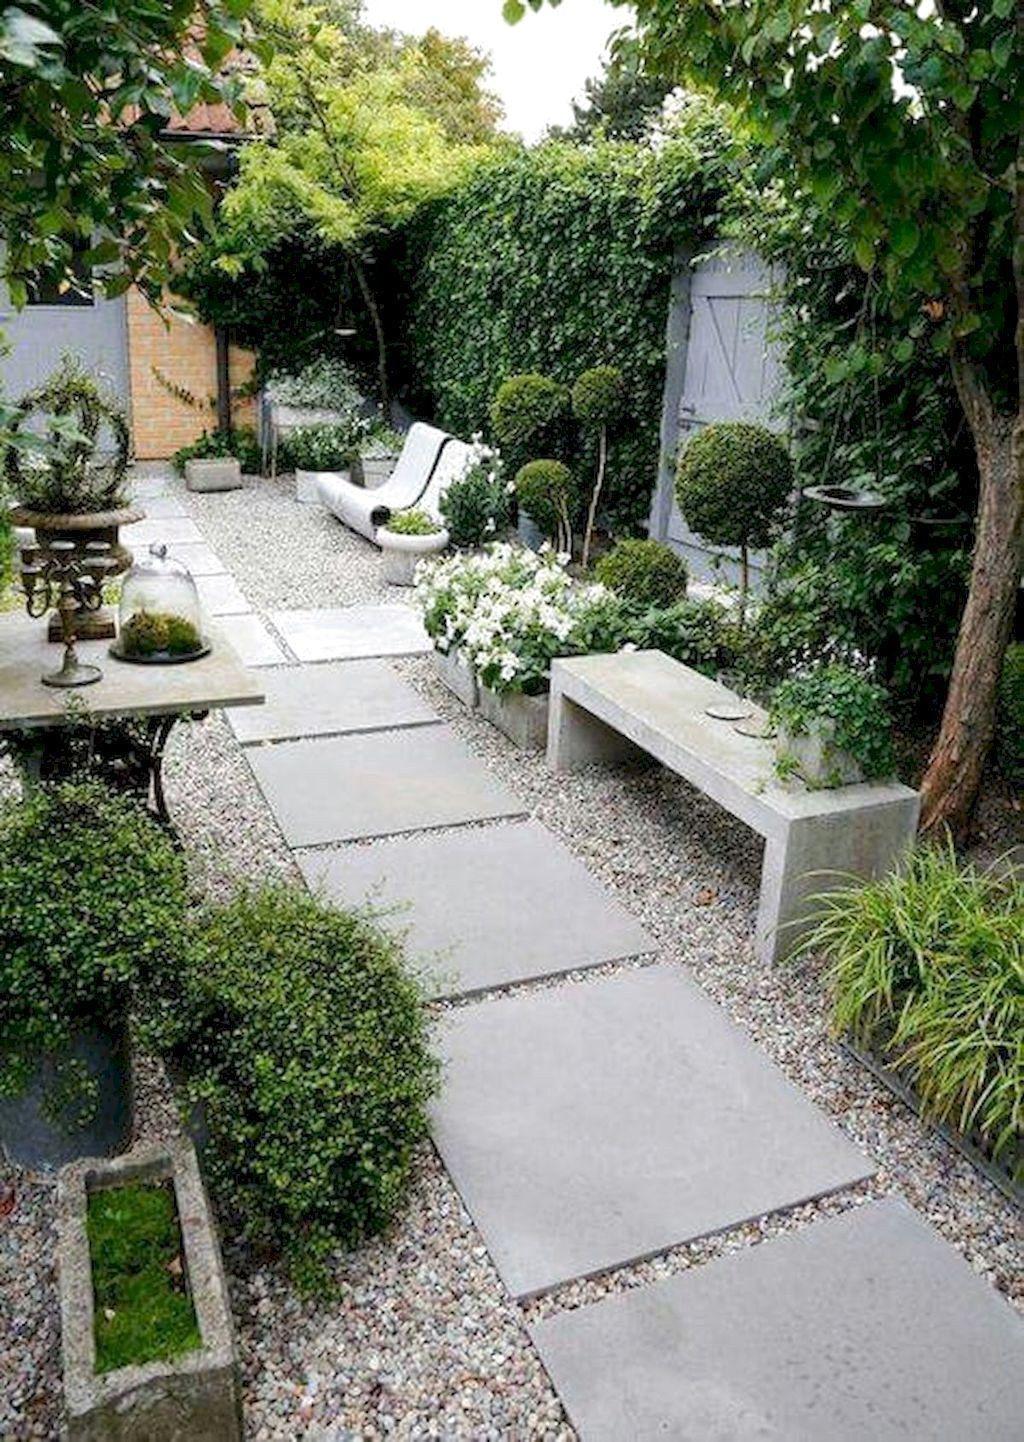 70 Favourite Side House Garden Landscaping Decoration Ideas With Rocks Home Garden Small Garden Design Garden Design Outdoor Gardens Design